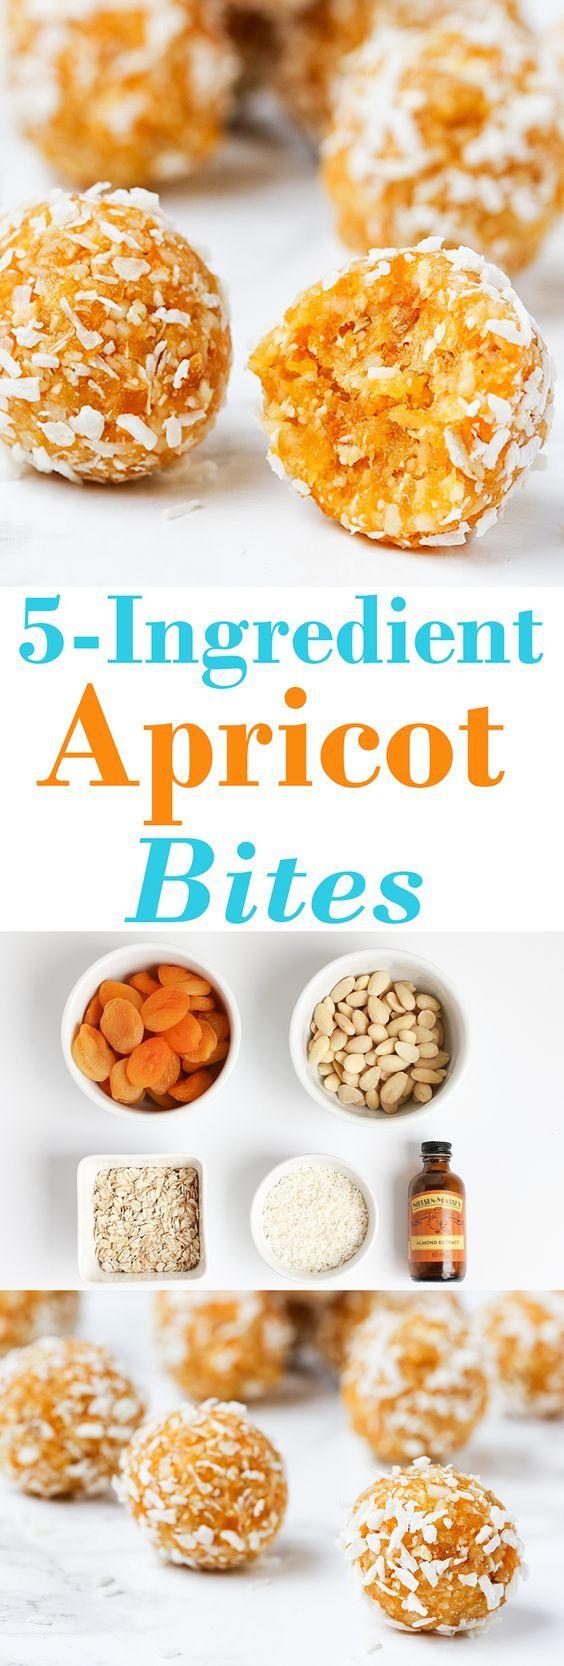 Gluten-Free 5-Ingredient Apricot Bites Recipe